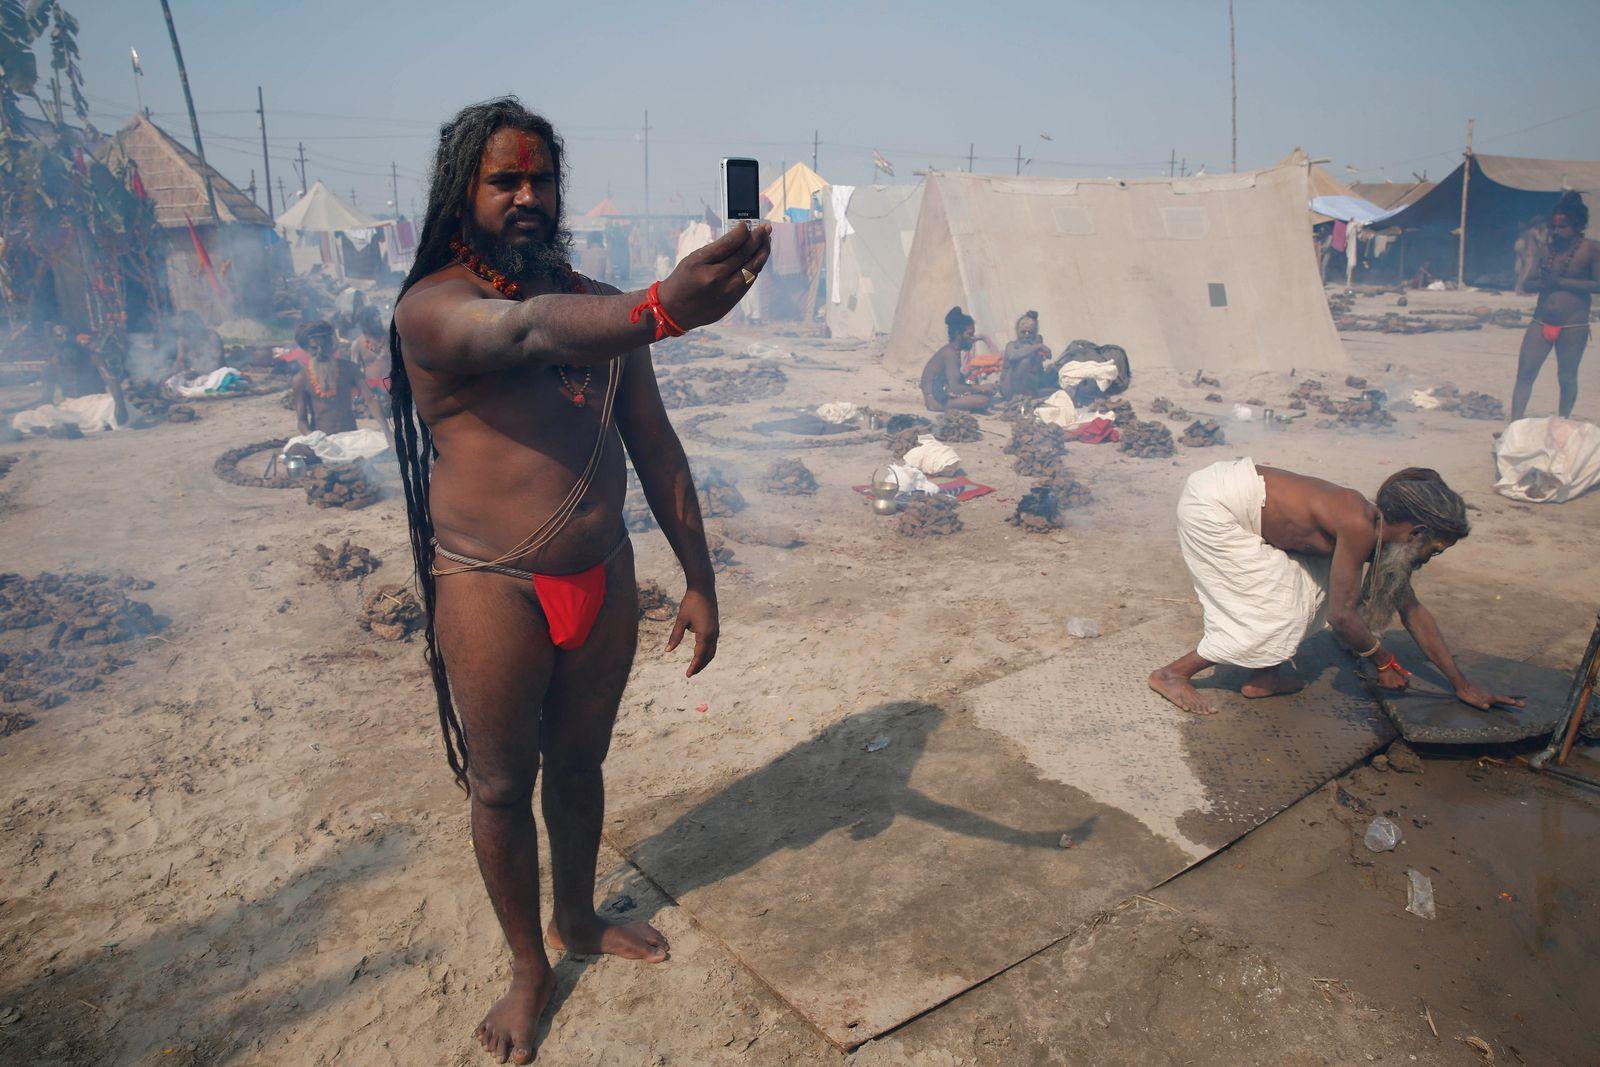 India/Smartphone